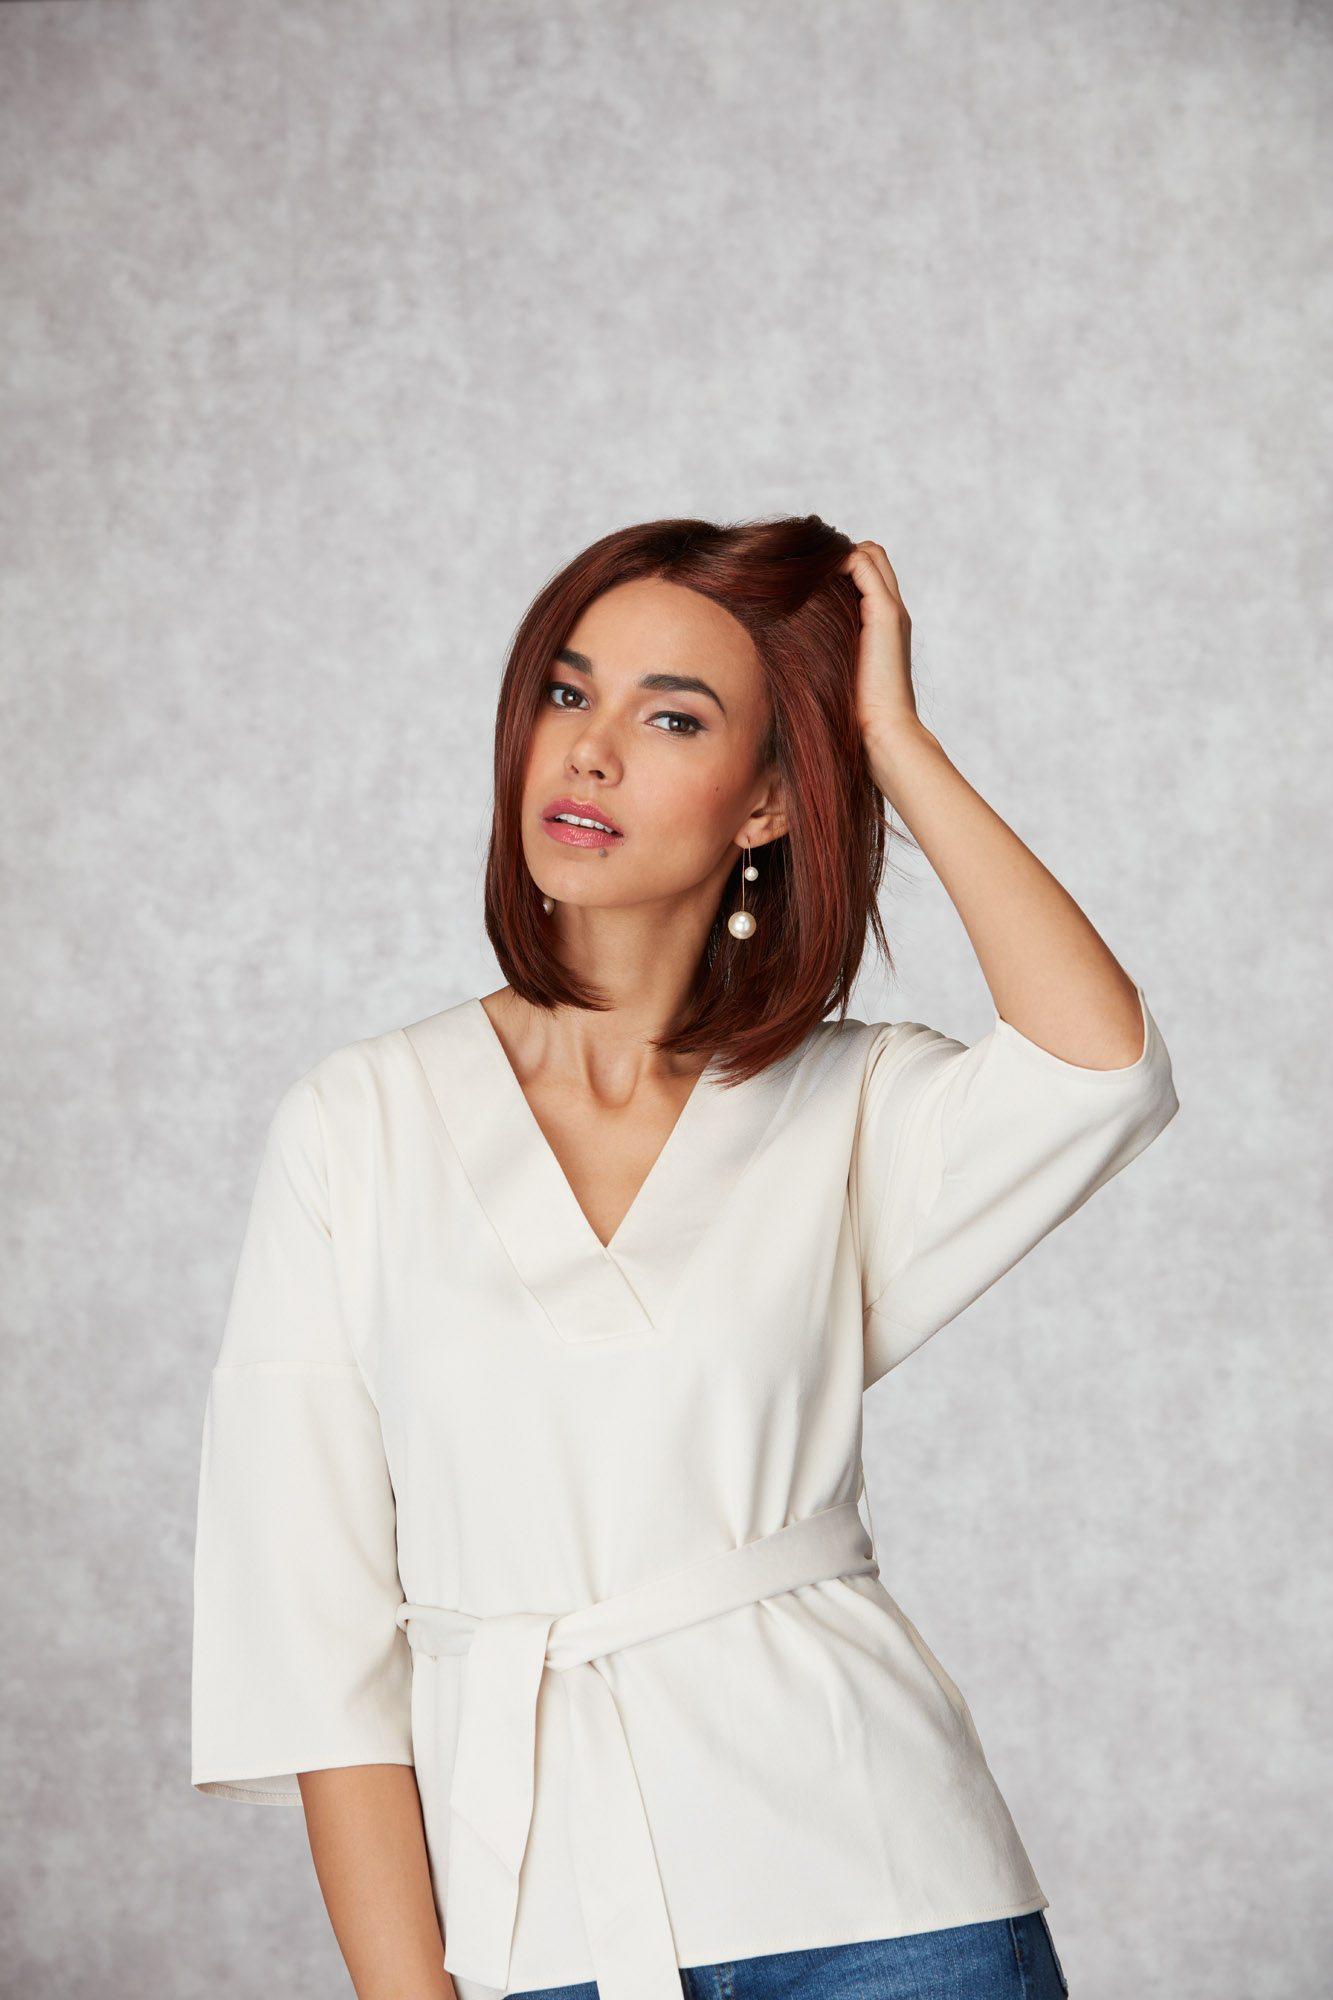 Shona Wig Hairworld - image Tranquil_RCG4_141 on https://purewigs.com